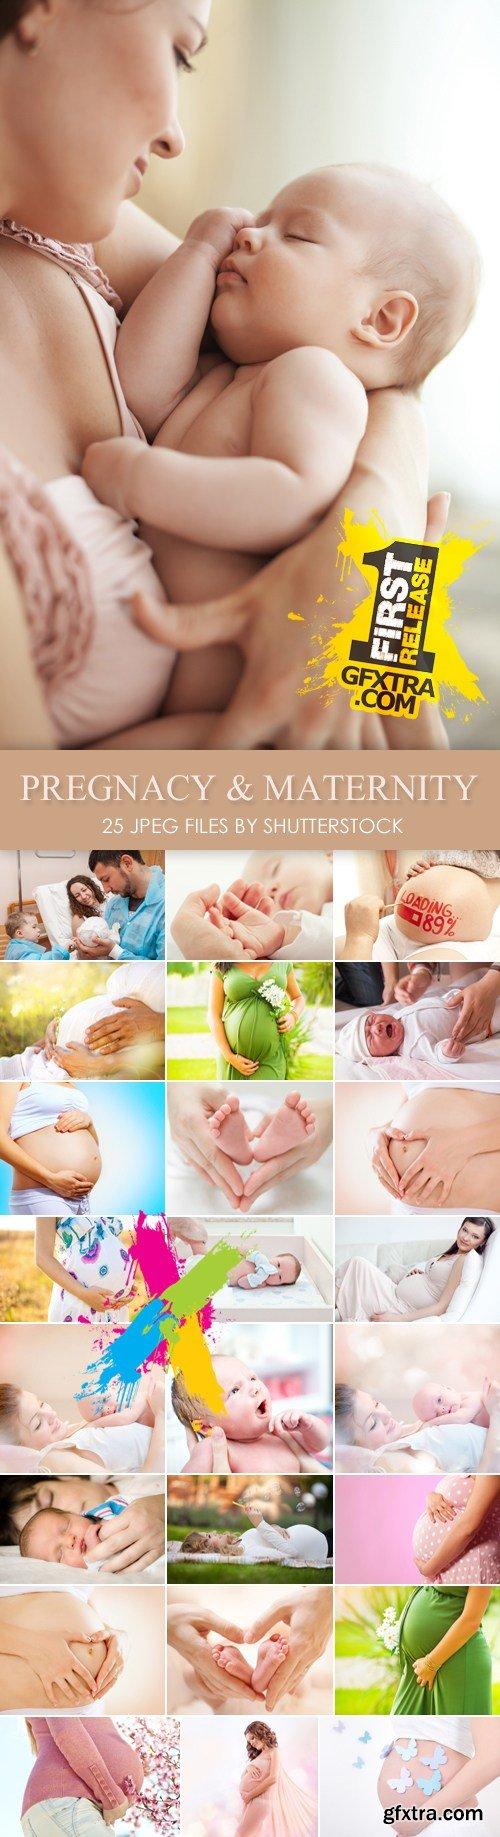 Stock Photo - Pregnacy & Maternity